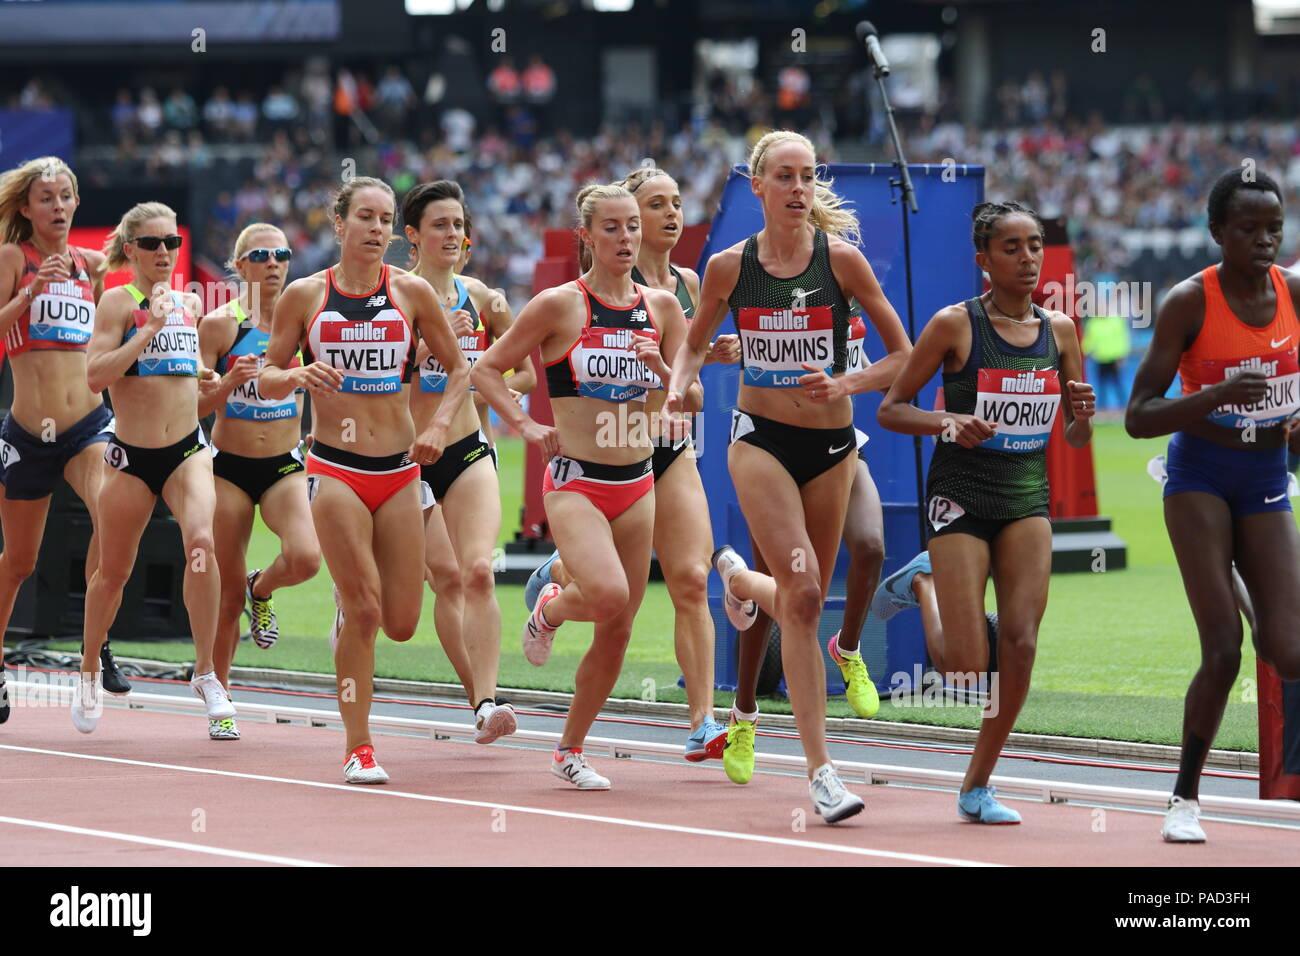 London, UK. 21st July, 2018. Women's 3000m at the IAAF Diamond League, Muller Anniversary Games, Queen Elizabeth Olympic, LONDON, UK 21 July 2018 Credit: Grant Burton/Alamy Live News - Stock Image